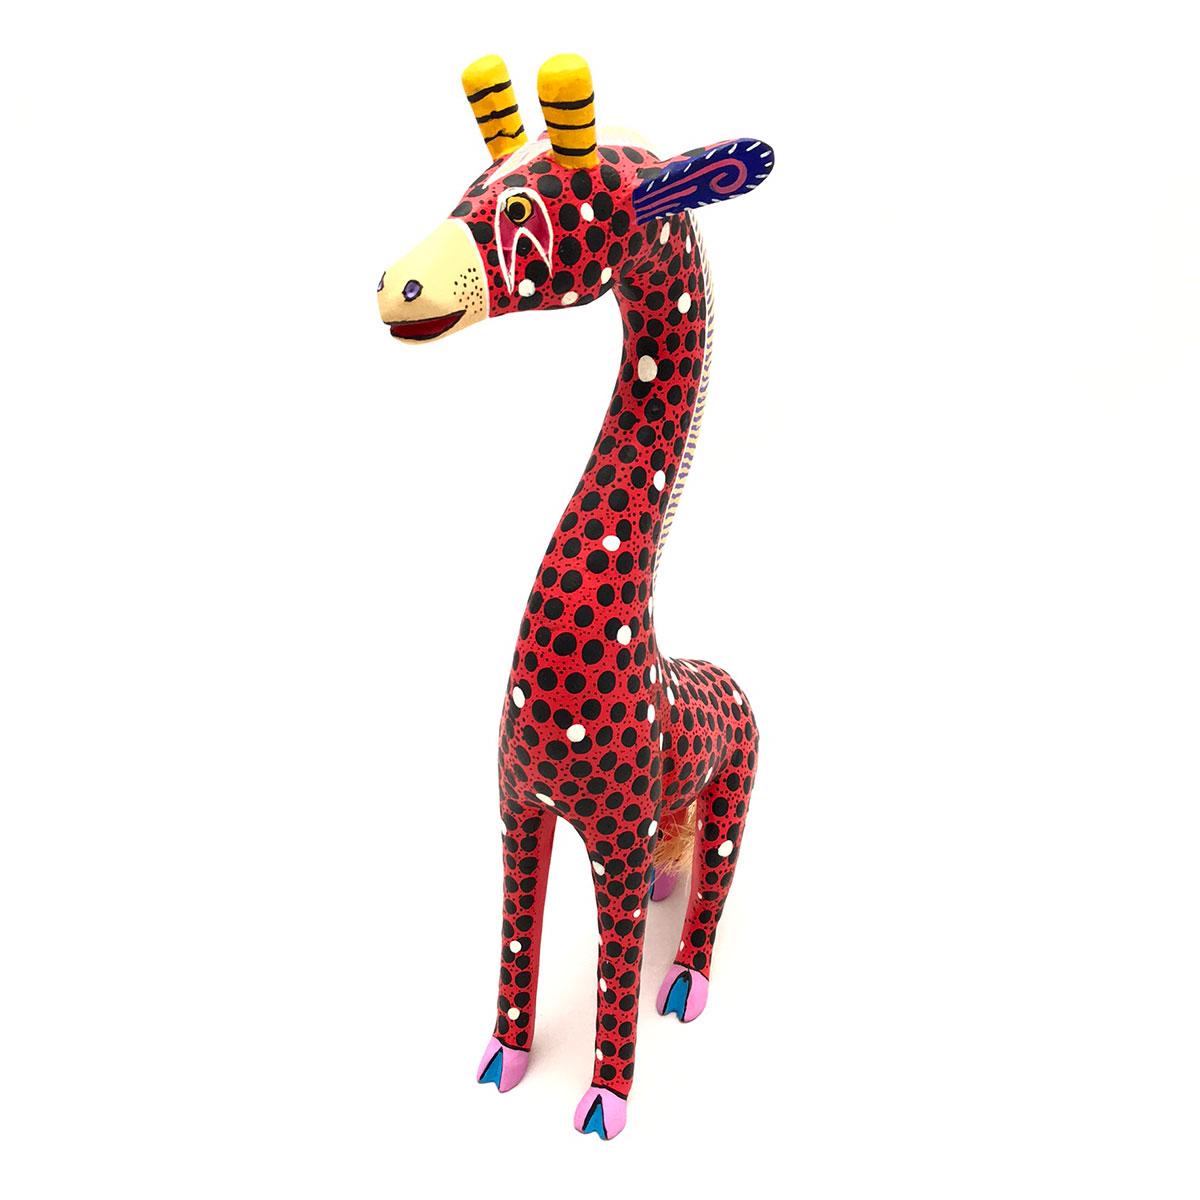 Gil Santiago Gil Santiago: Medium Red Giraffe African Animals